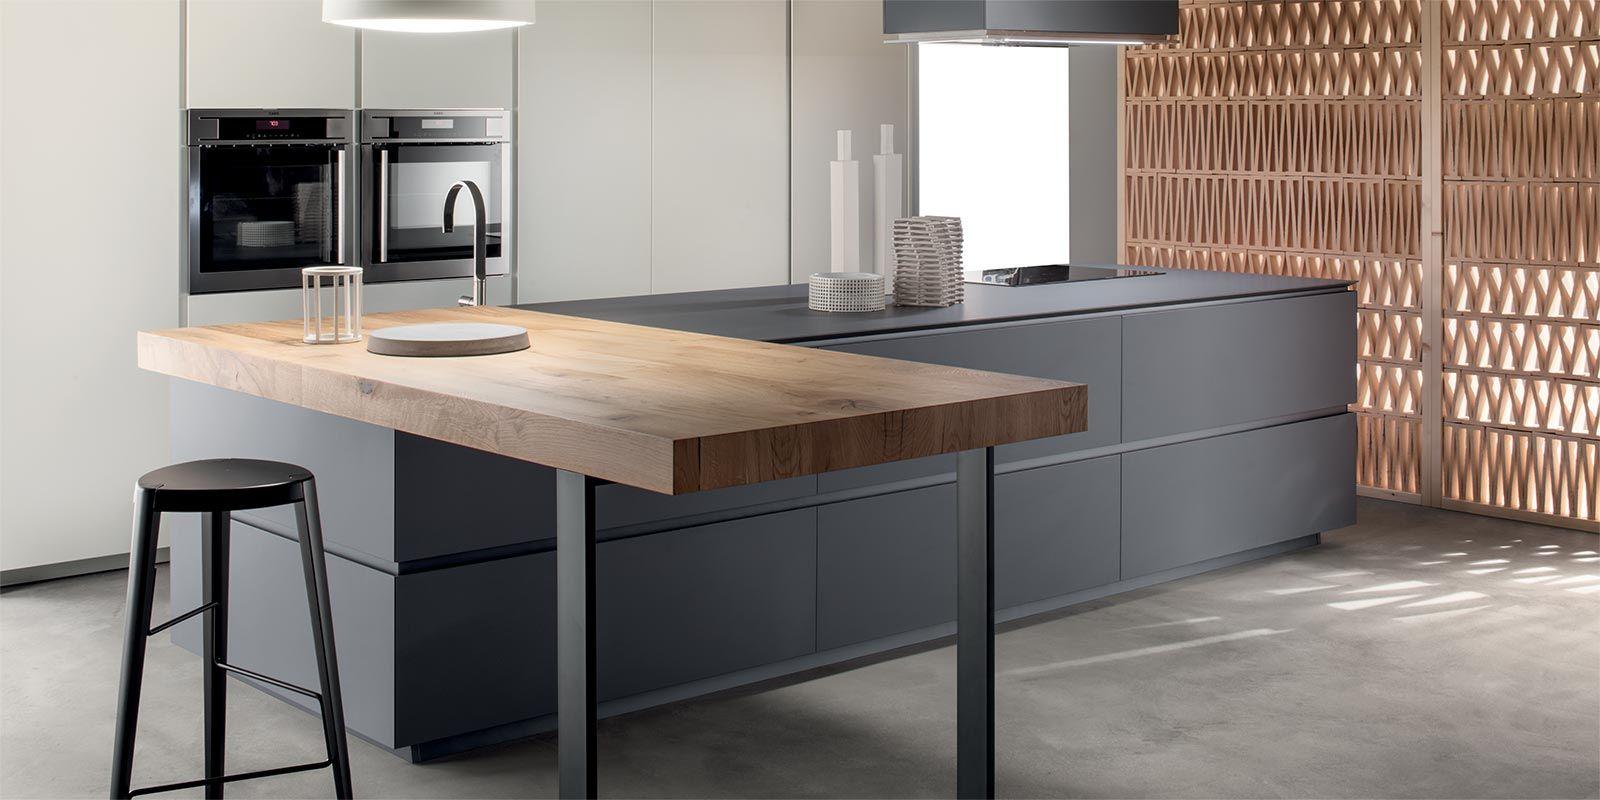 Italian Modern Design Kitchens - Obliqua by Ernestomeda | House ...